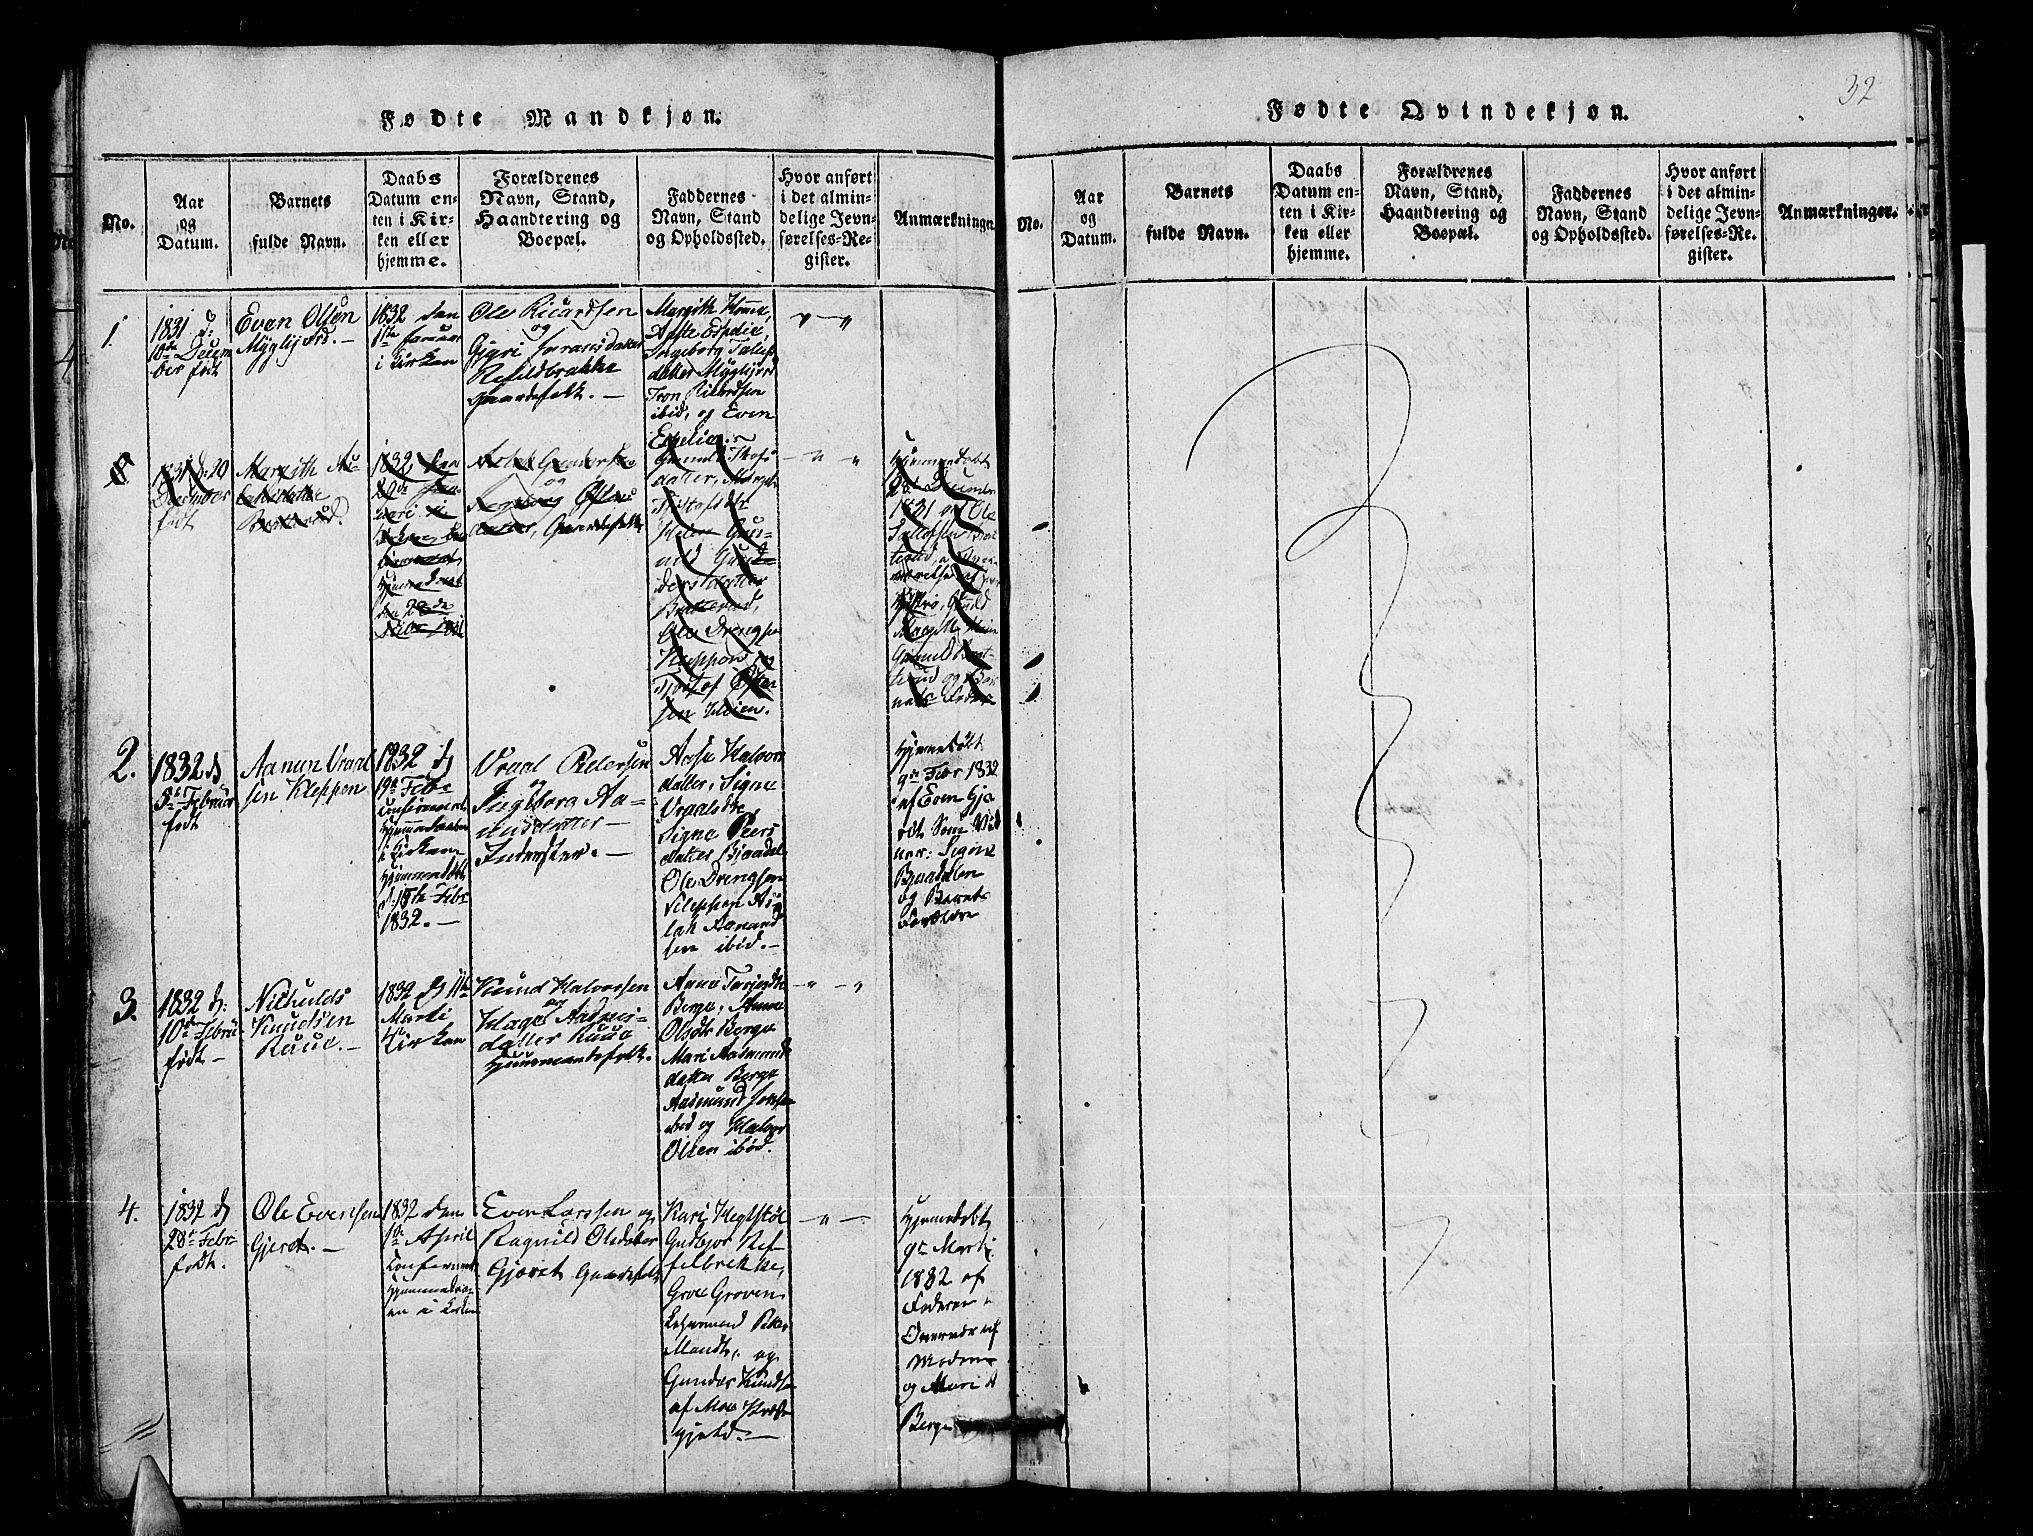 SAKO, Lårdal kirkebøker, G/Gb/L0001: Klokkerbok nr. II 1, 1815-1865, s. 32